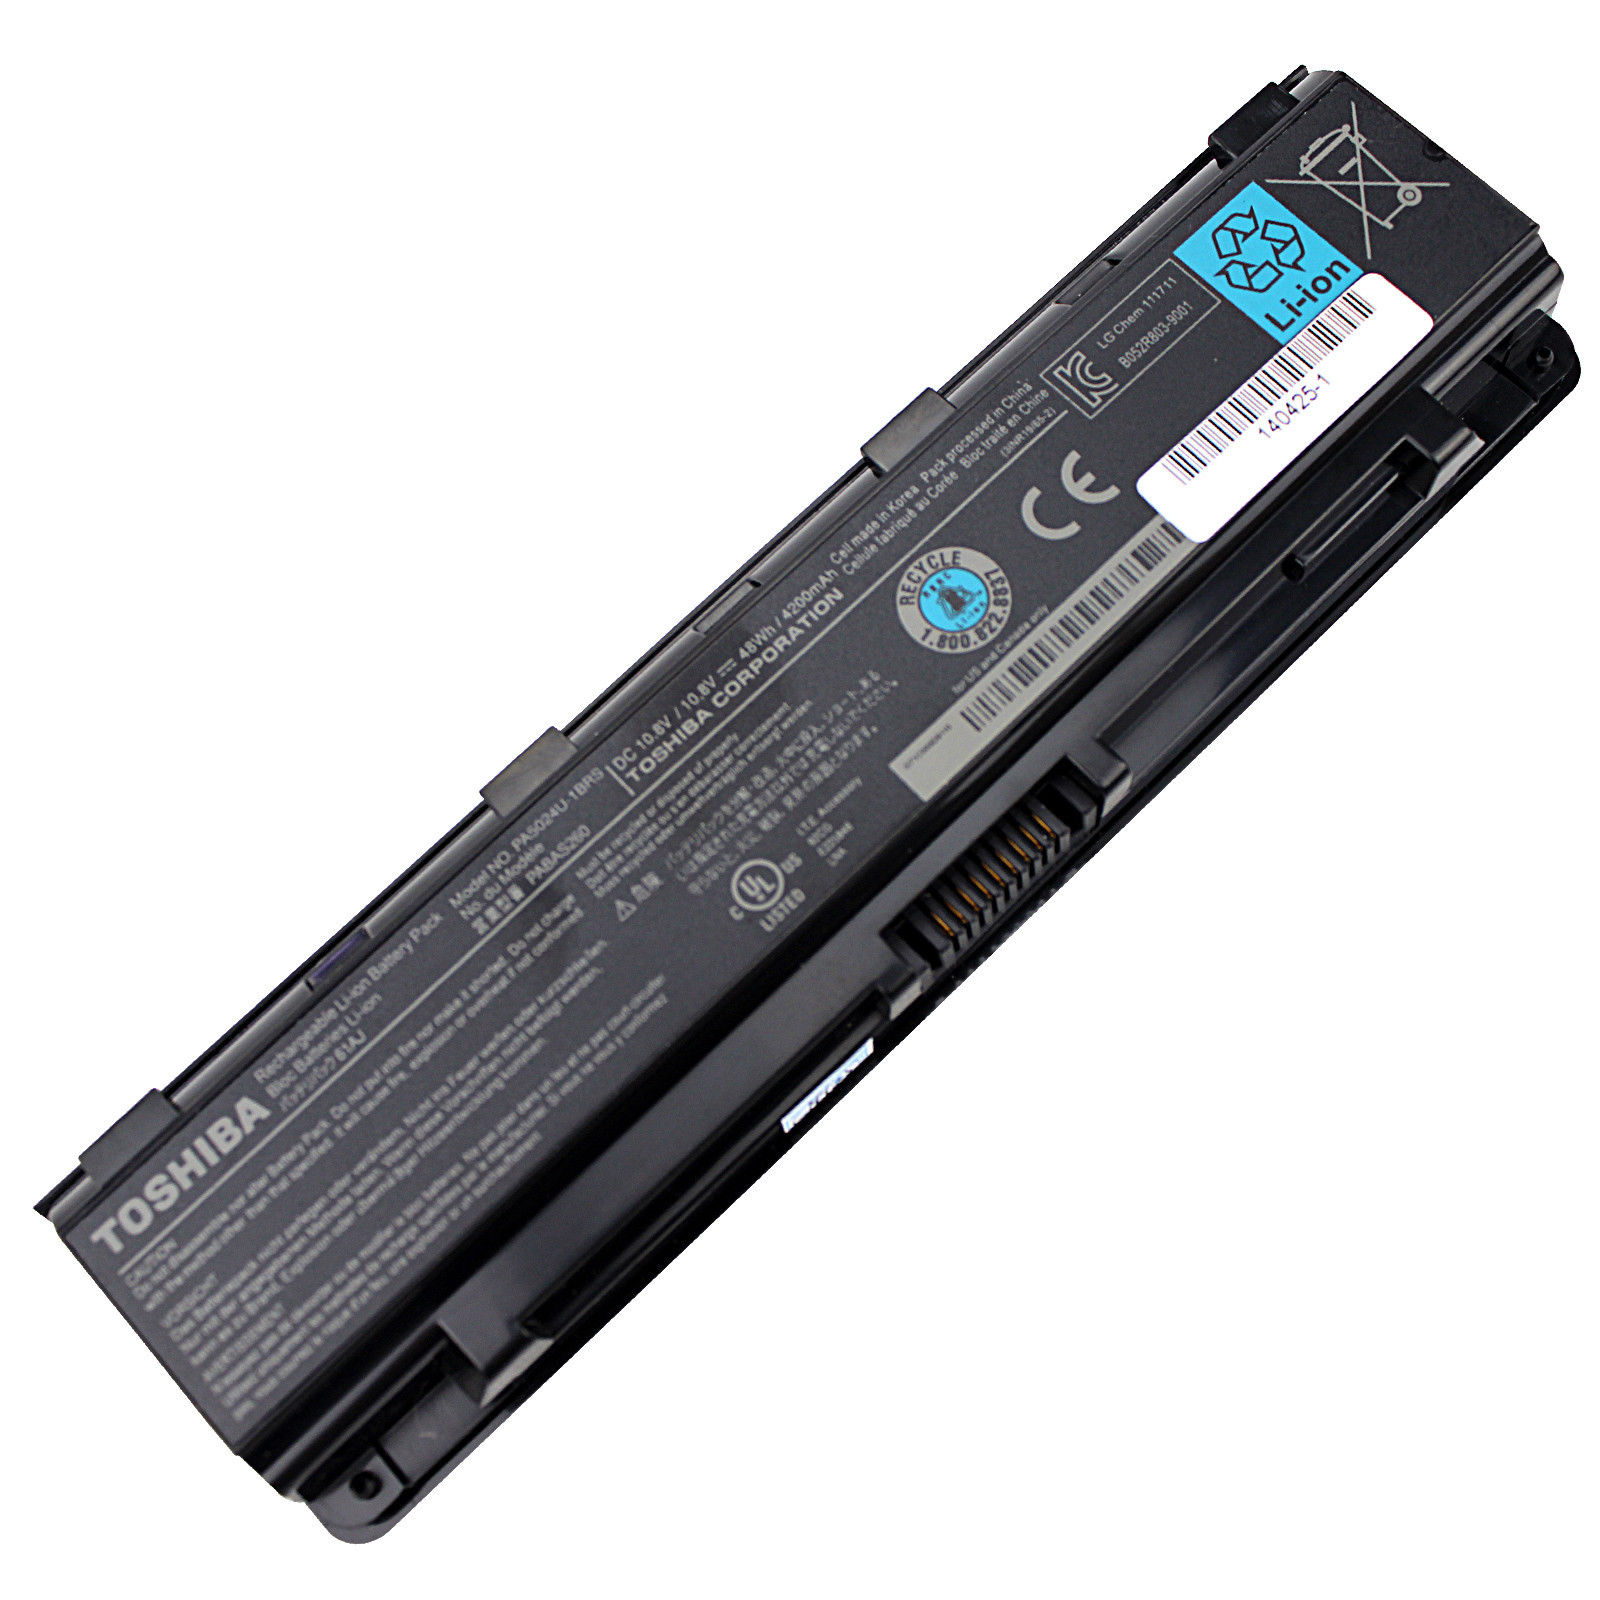 Original Baterai Toshiba Satelite C800 C800D C840 C845 C850 C855 C870 L800 L840 L845 L850 L855 L870D, M800 M840 M845 M850, P800 P840 P850 P870 P875D / Satellite S840 S840D / PA5023 PA5024 PA5025 PA5026 PA5027 PABAS259 PABAS260 Garansi 30 hari.